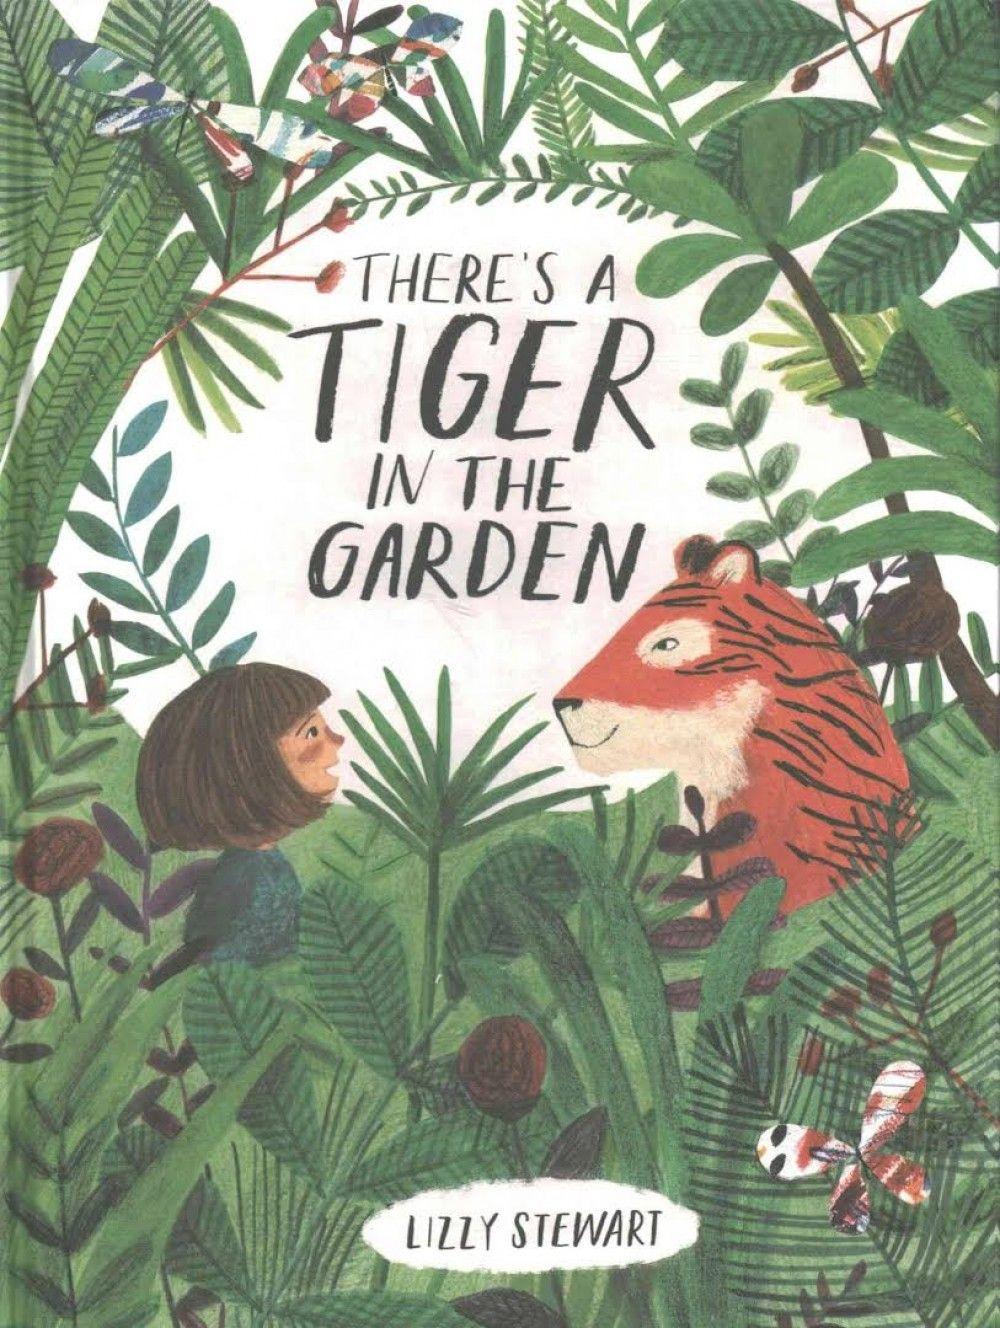 🎓 The 100 Best Children's Books of 2018